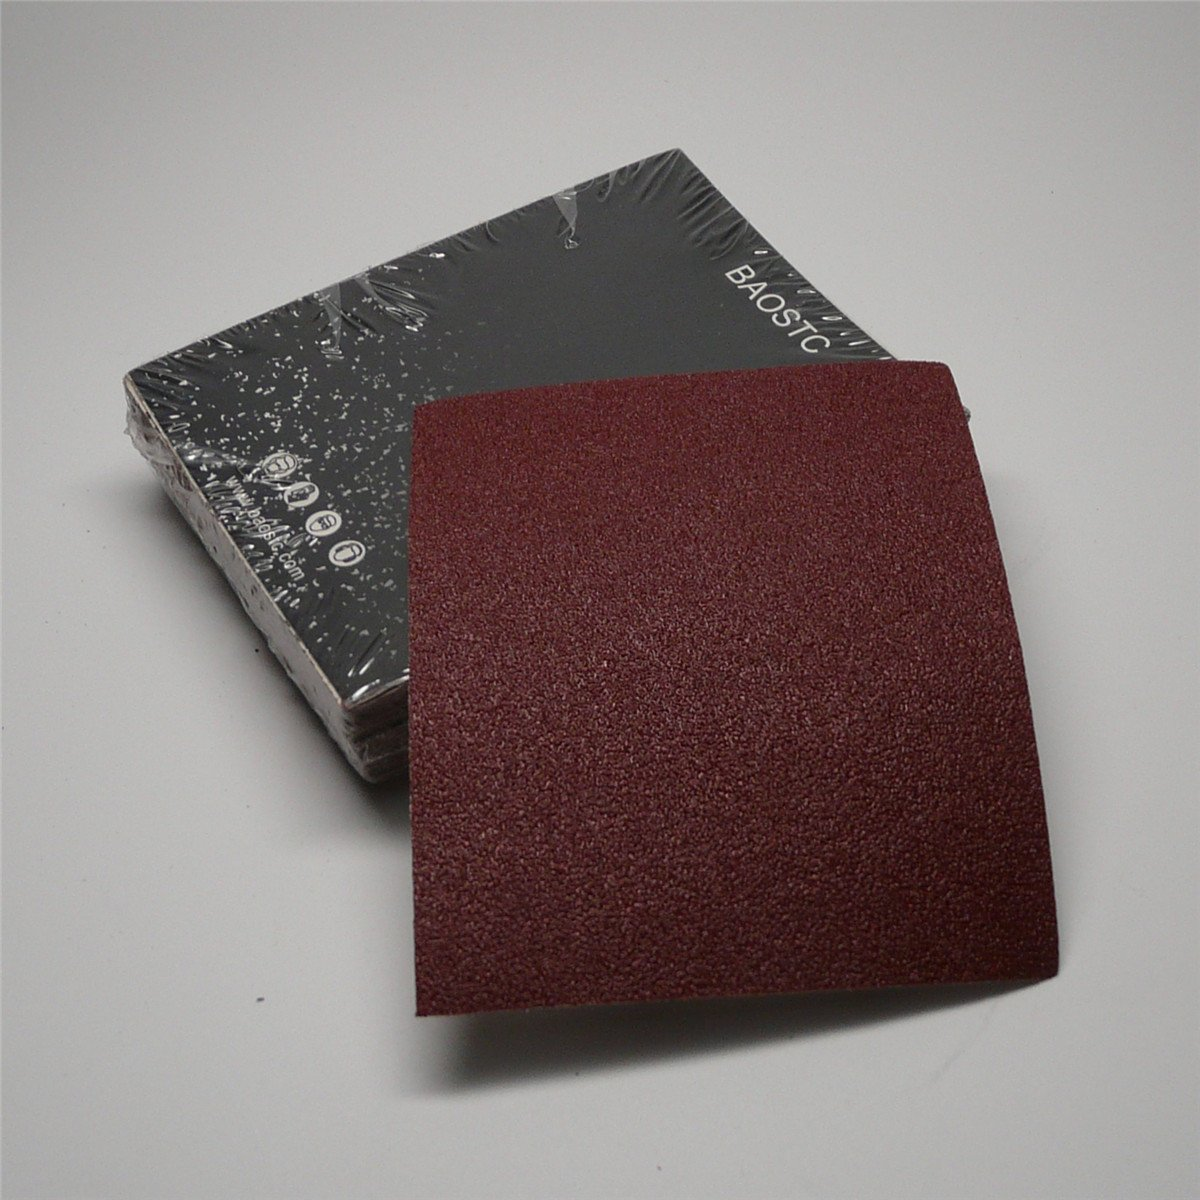 BAOSTC 1/4 sandpaper sheet, 4-1/2'*5-1/2' Assorted 60-80-120, 50PACK 4-1/2*5-1/2 Assorted 60-80-120